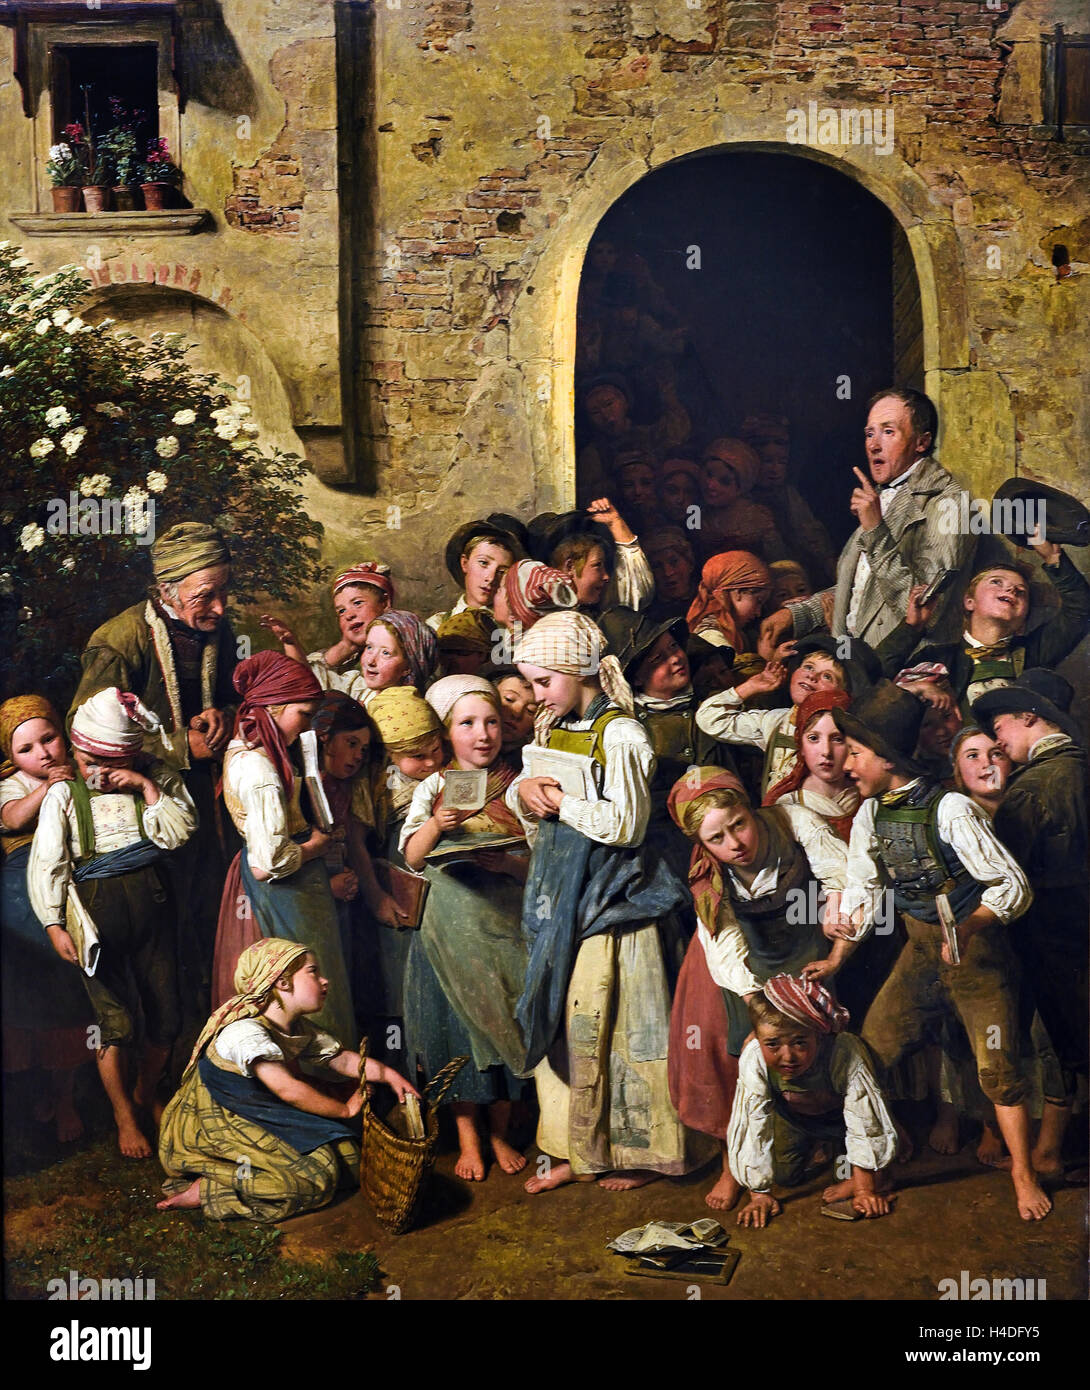 After School 1841 Ferdinand Georg Waldmuller 1793-1865 Austria Austrian - Stock Image